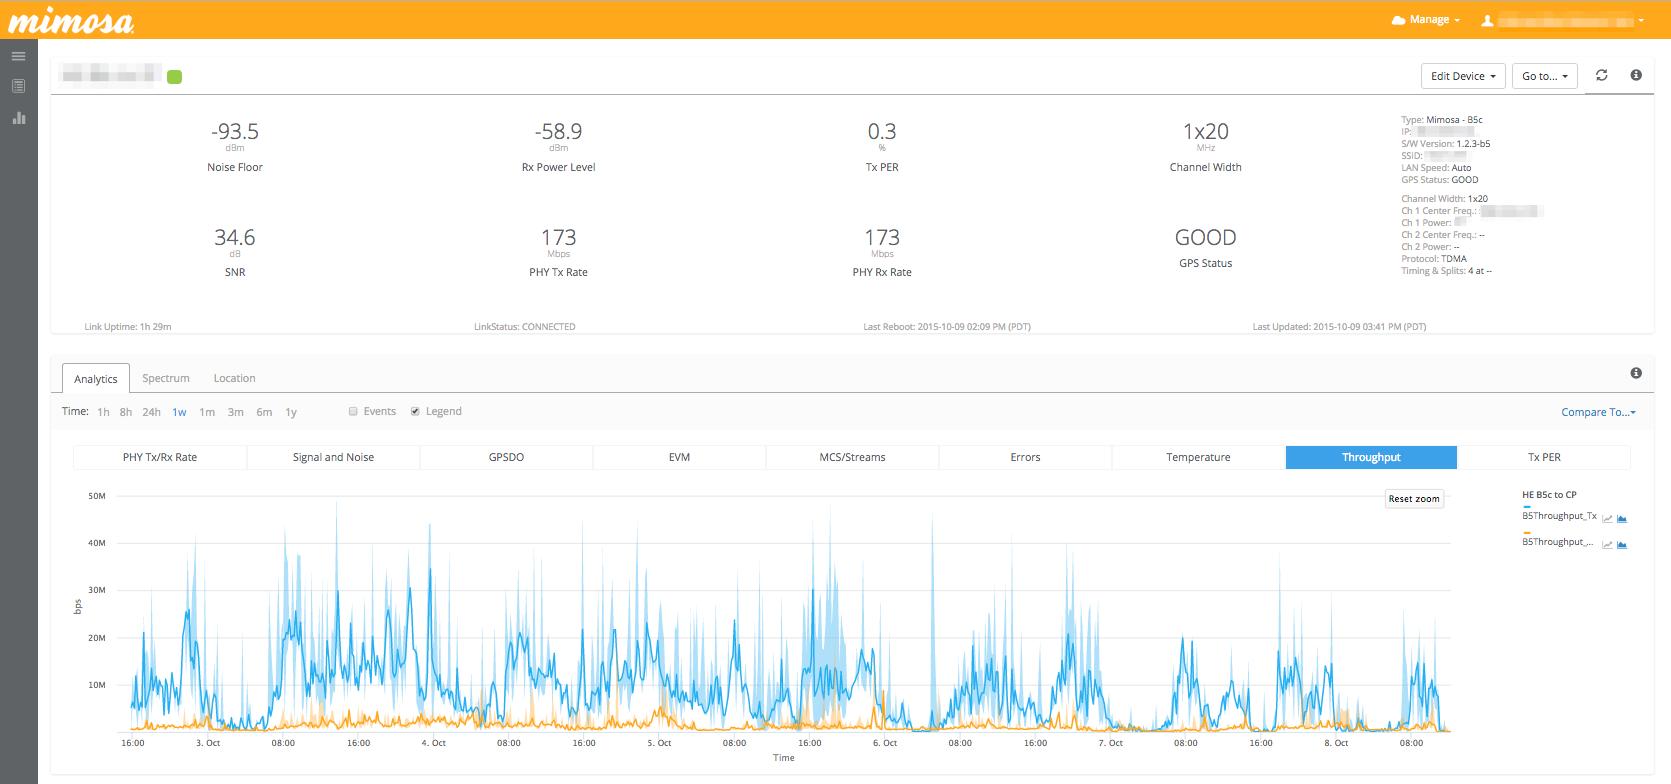 cloud_stats.png#asset:104